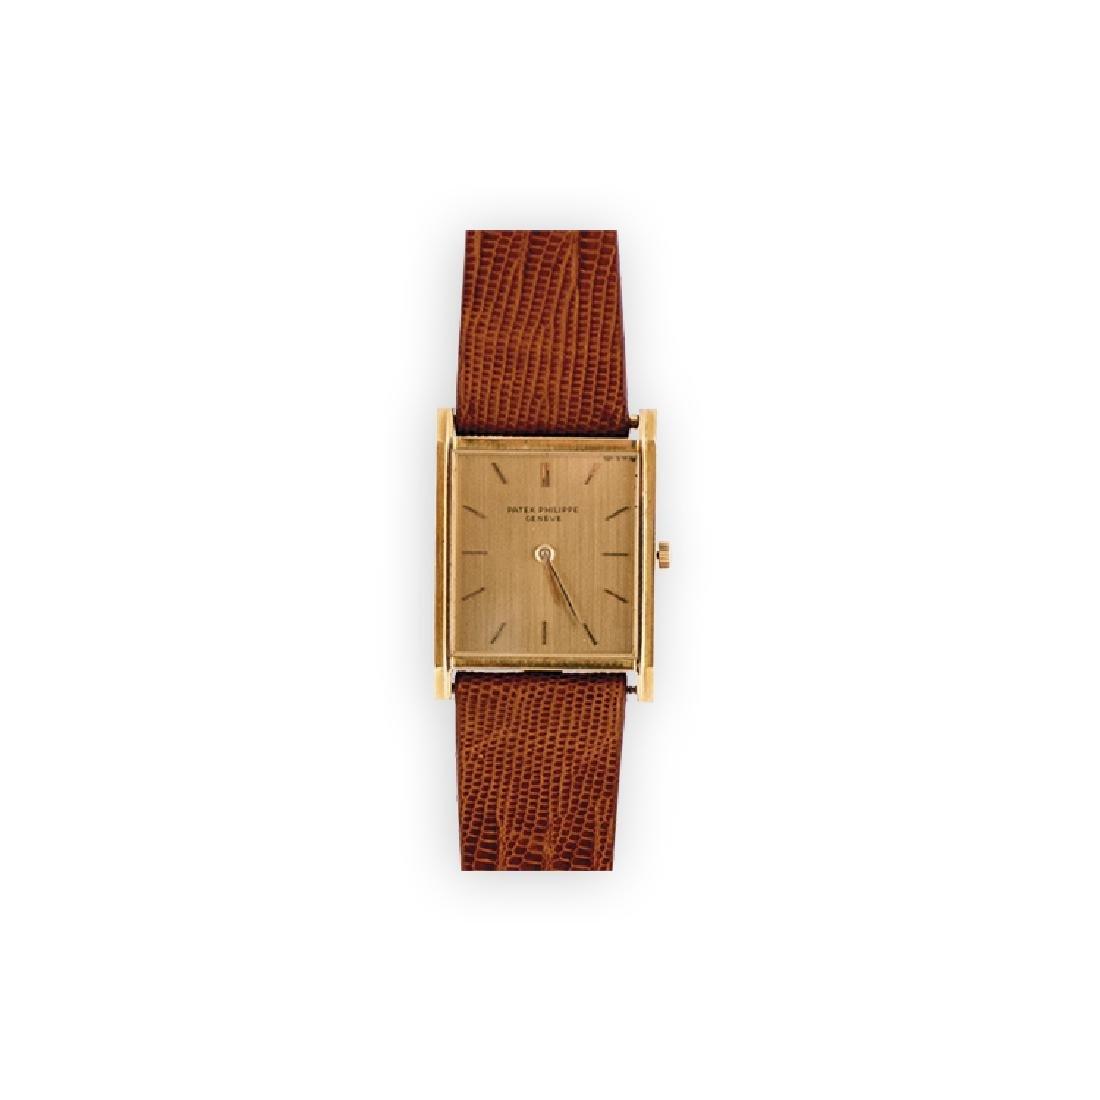 PATEK PHILIPPE rectangular gold watch